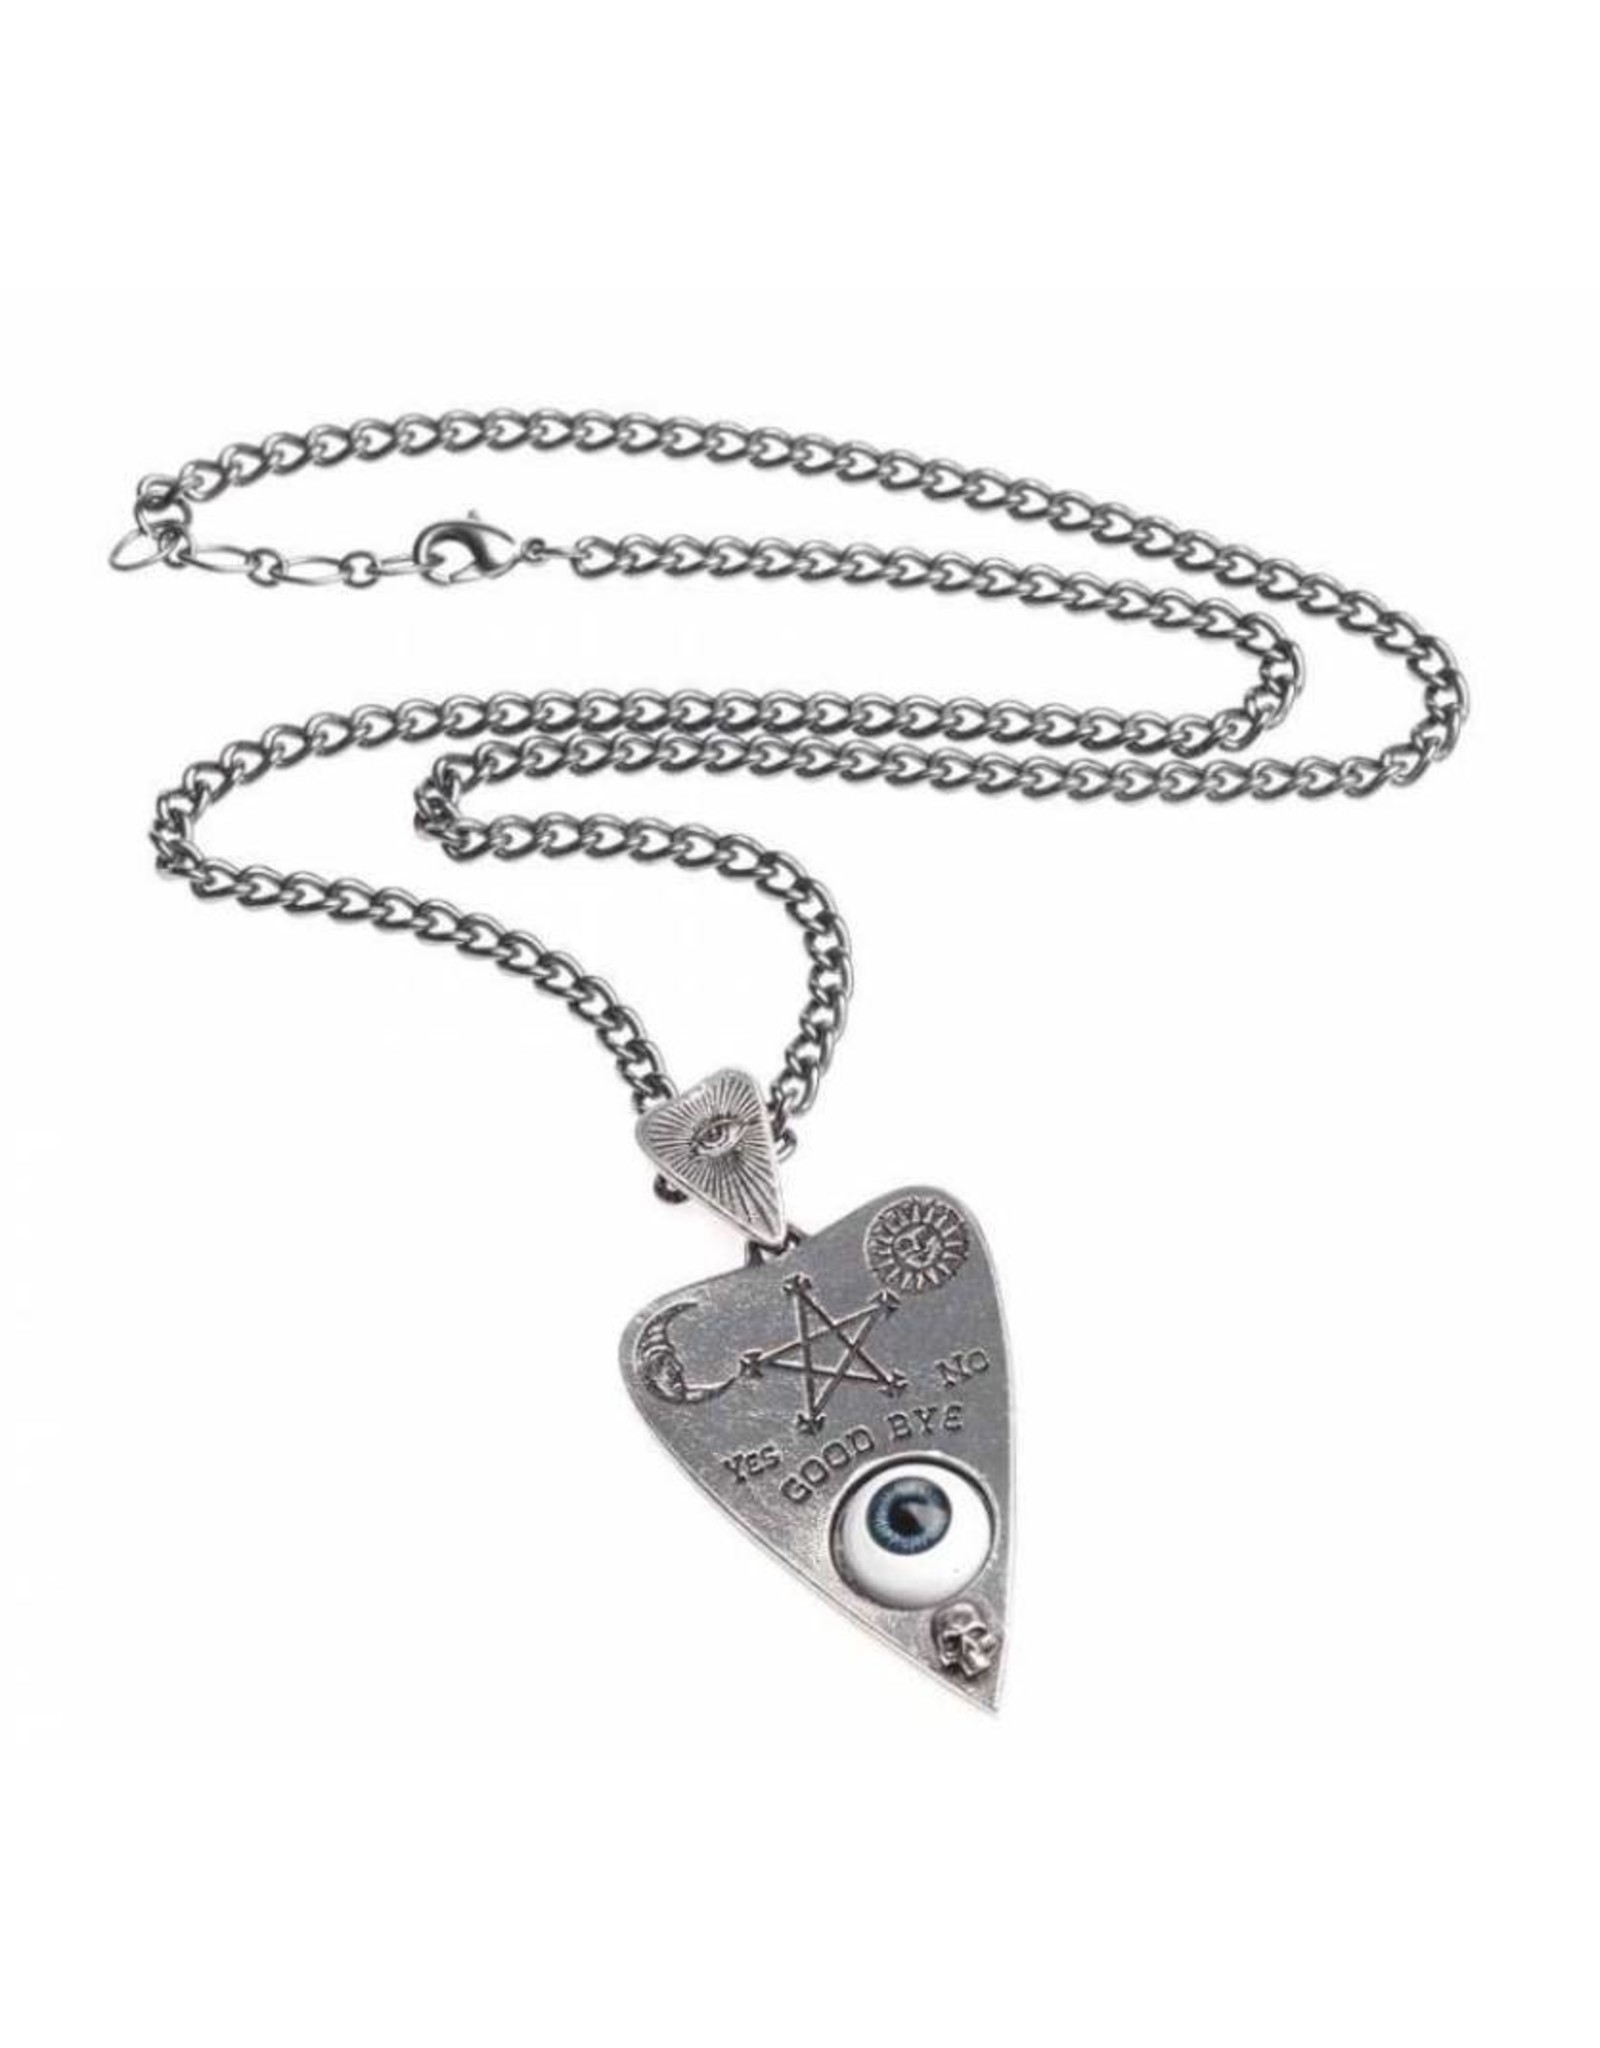 Alchemy Wicca en Occult sieraden - Planchette hanger en ketting Alchemy